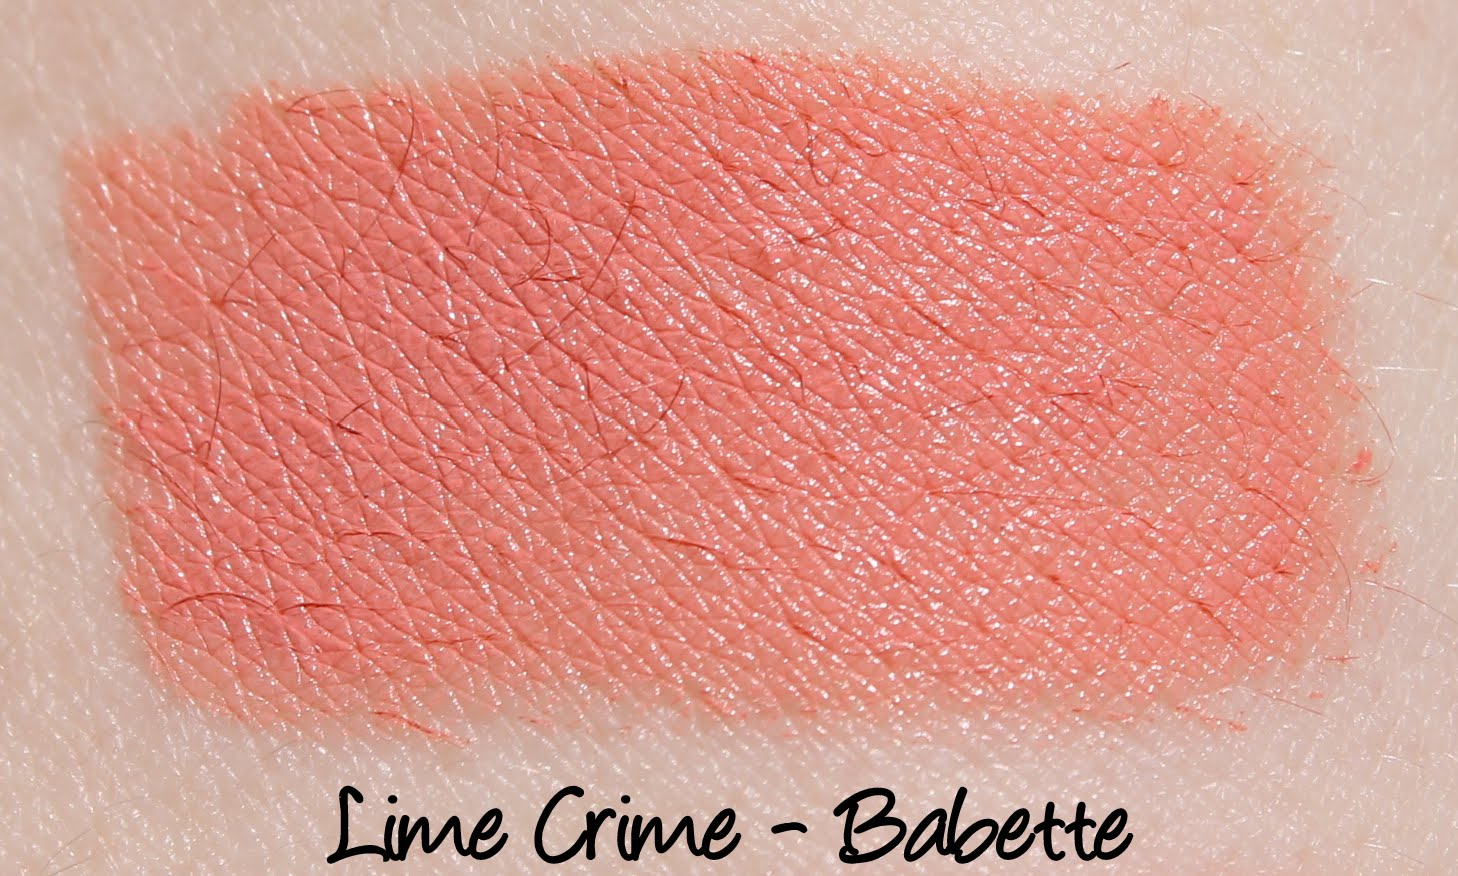 Lime Crime Babette Lipstick Swatch